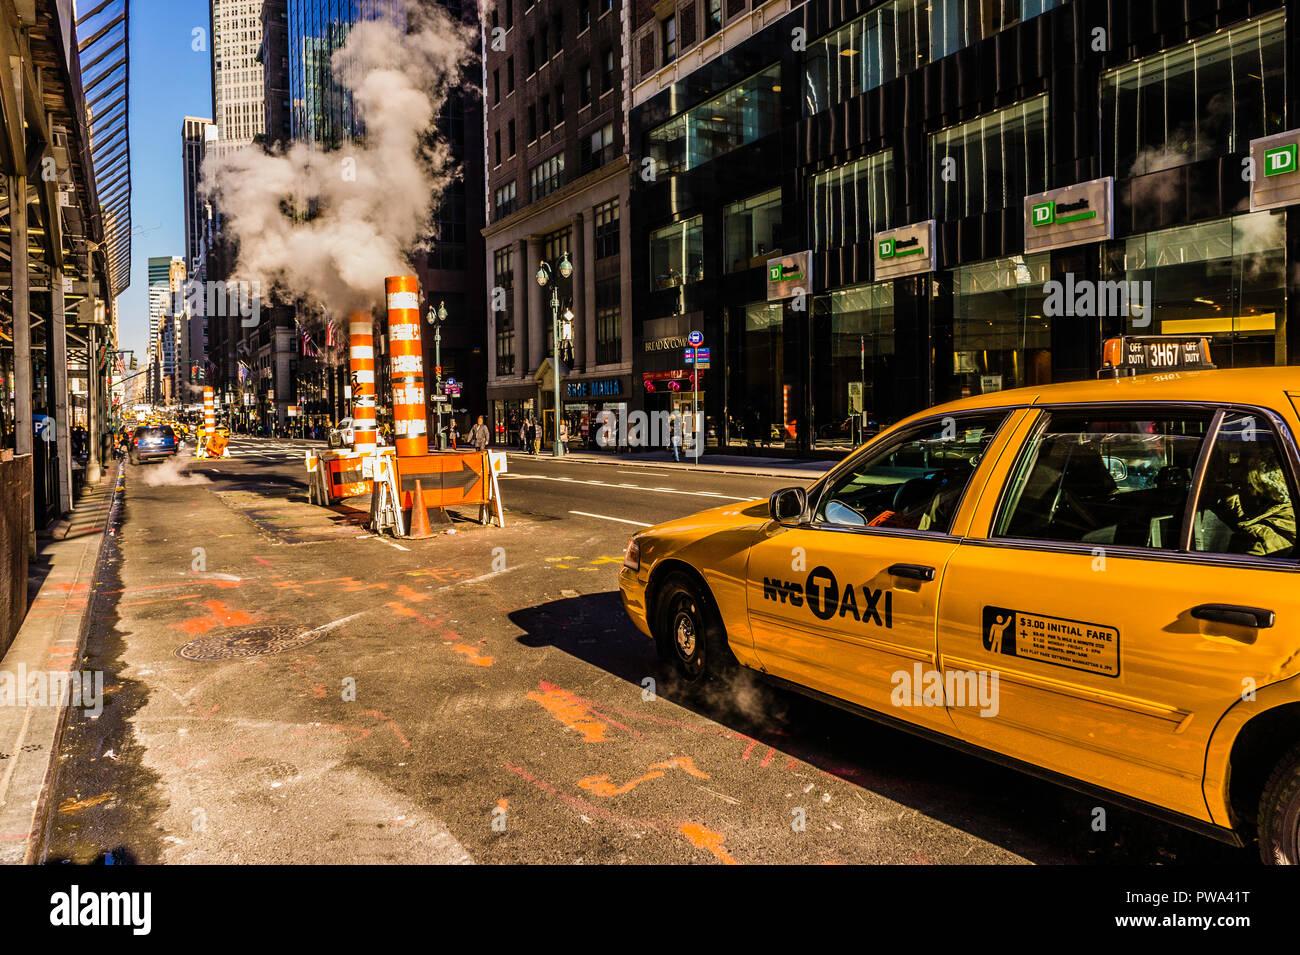 New York City steam system Vents Manhattan _ New York, New York, USA - Stock Image